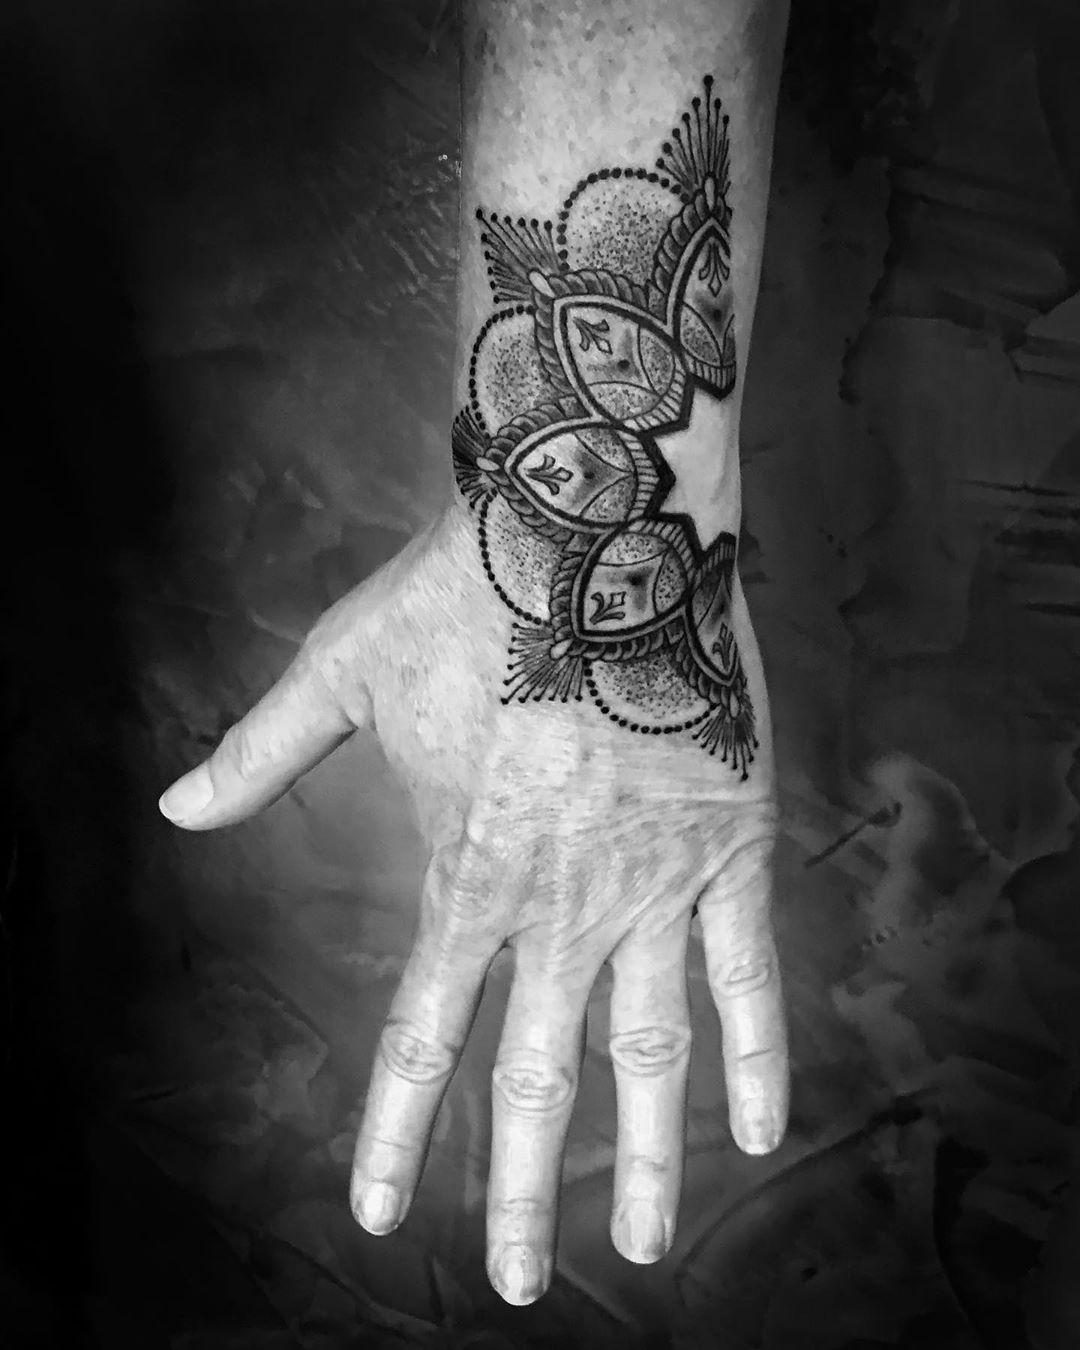 #tattoo #tattooing #tatovering#handjob #formula23 #bottrop#zeitgeist#zeitgeistta...